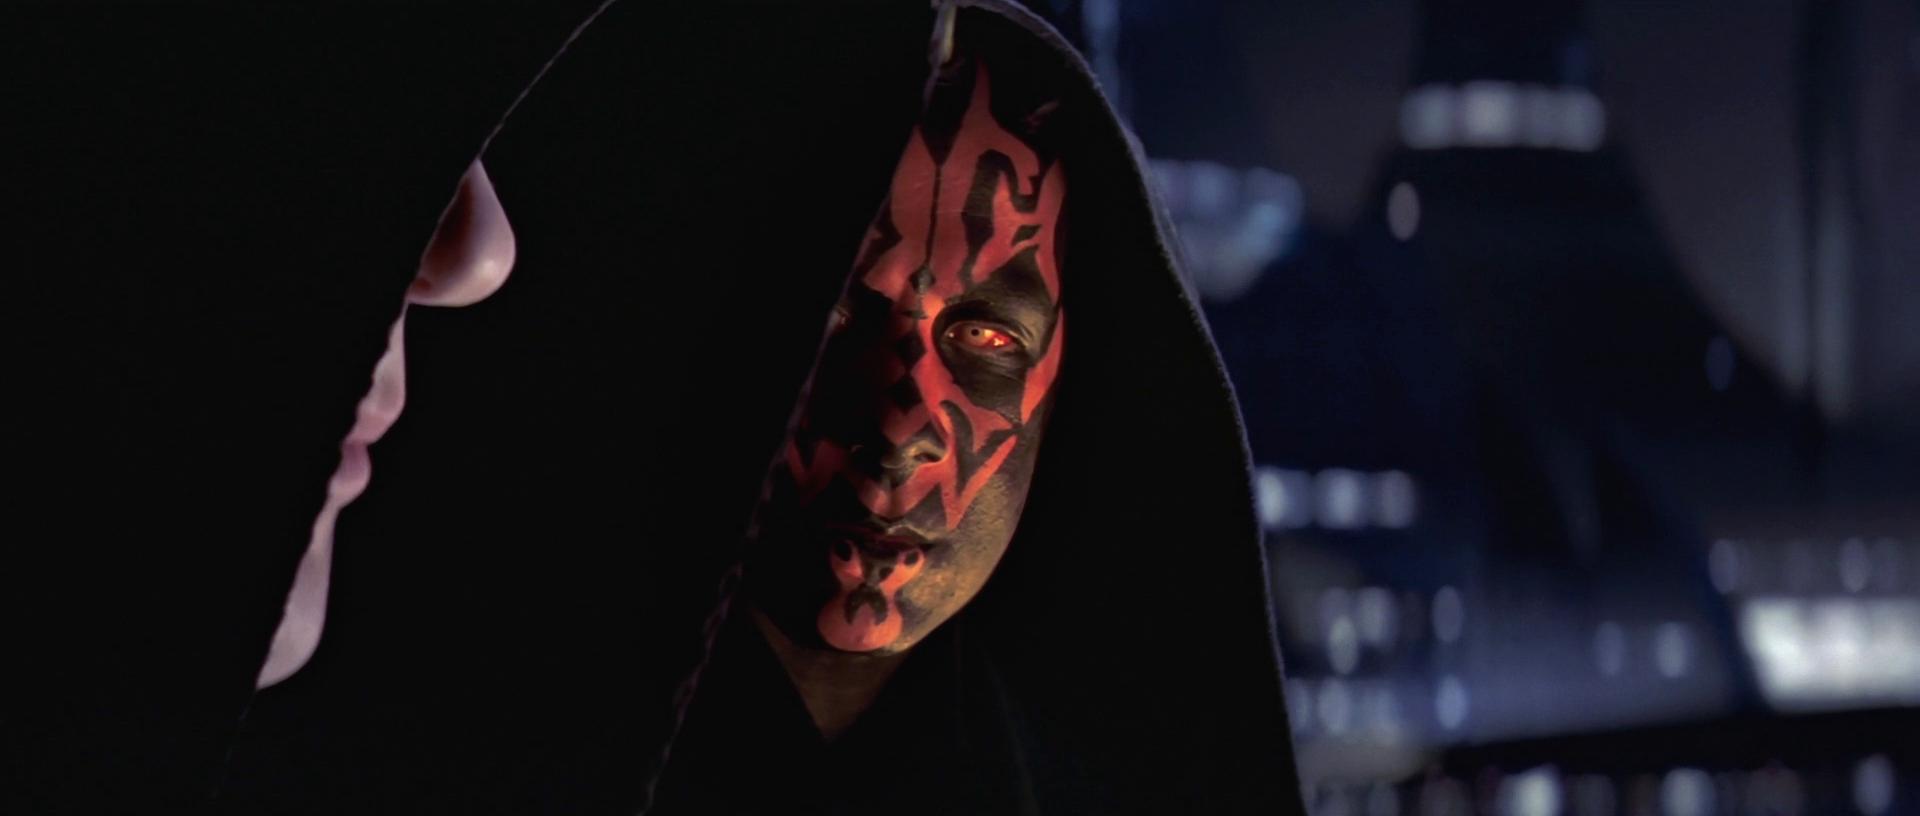 Darth Sidious Recruits Count Dooku As A Figurehead Sith Apprentice